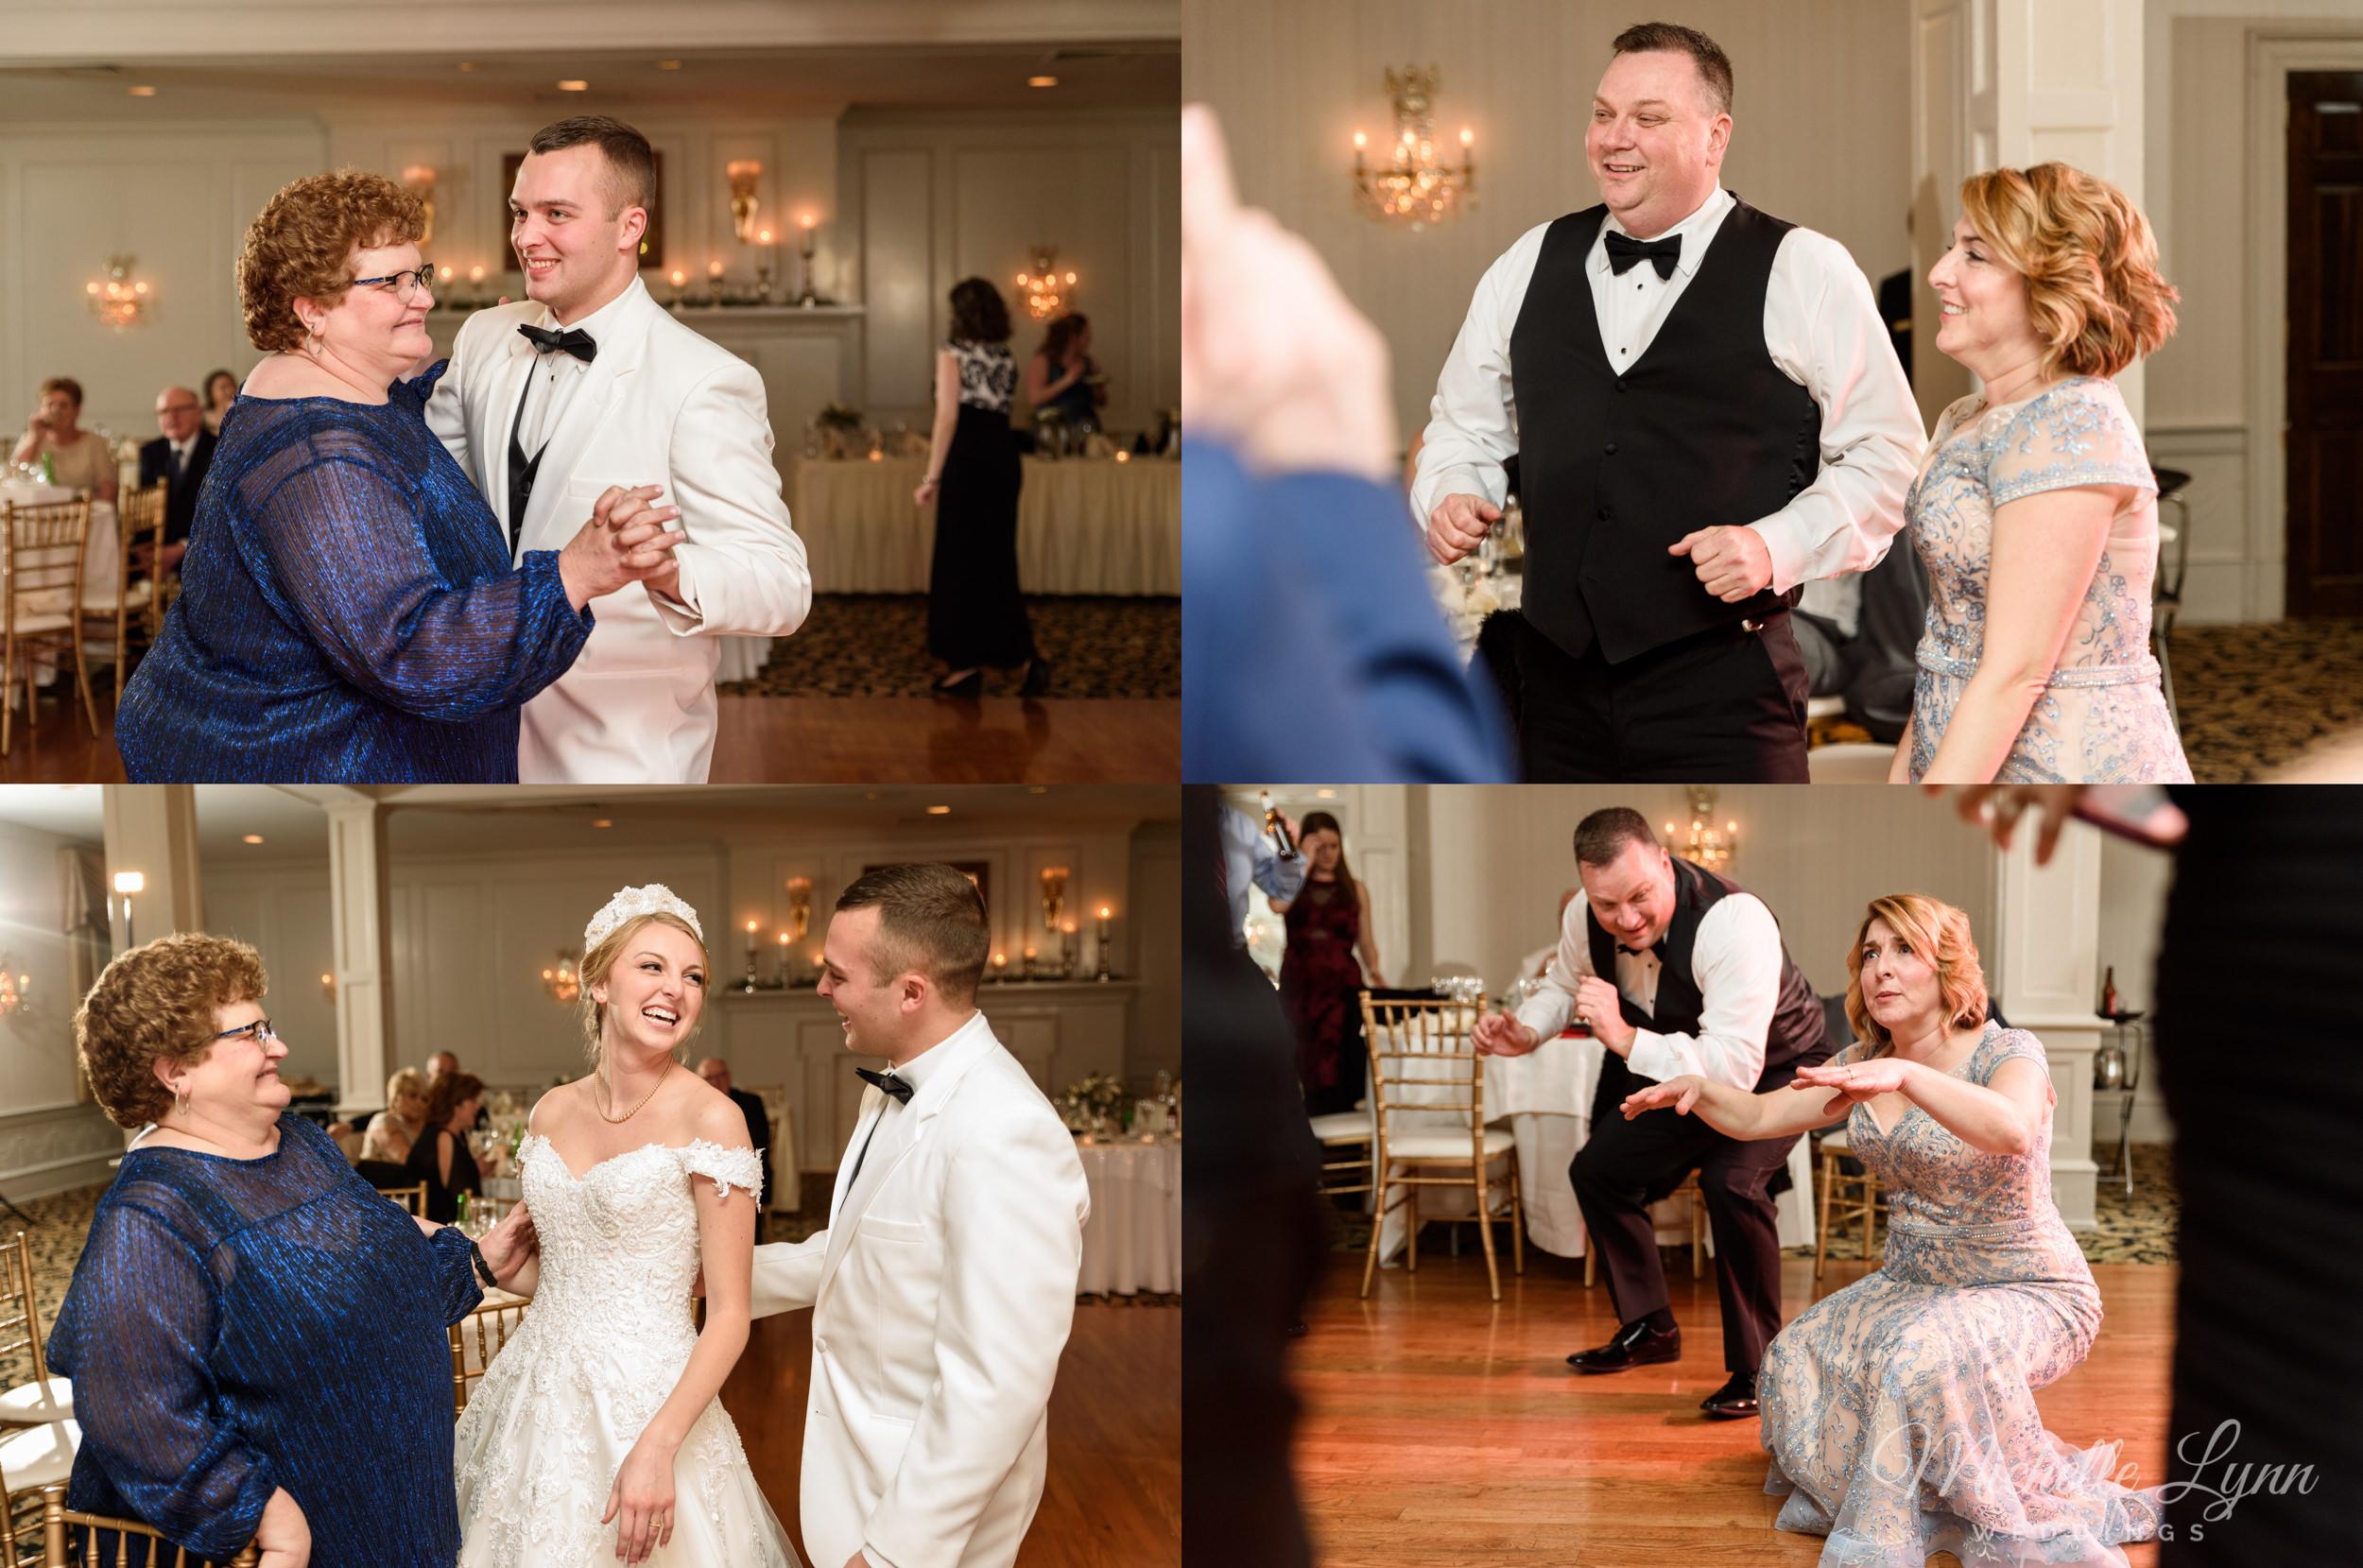 william-penn-inn-wedding-photography-mlw-122.jpg